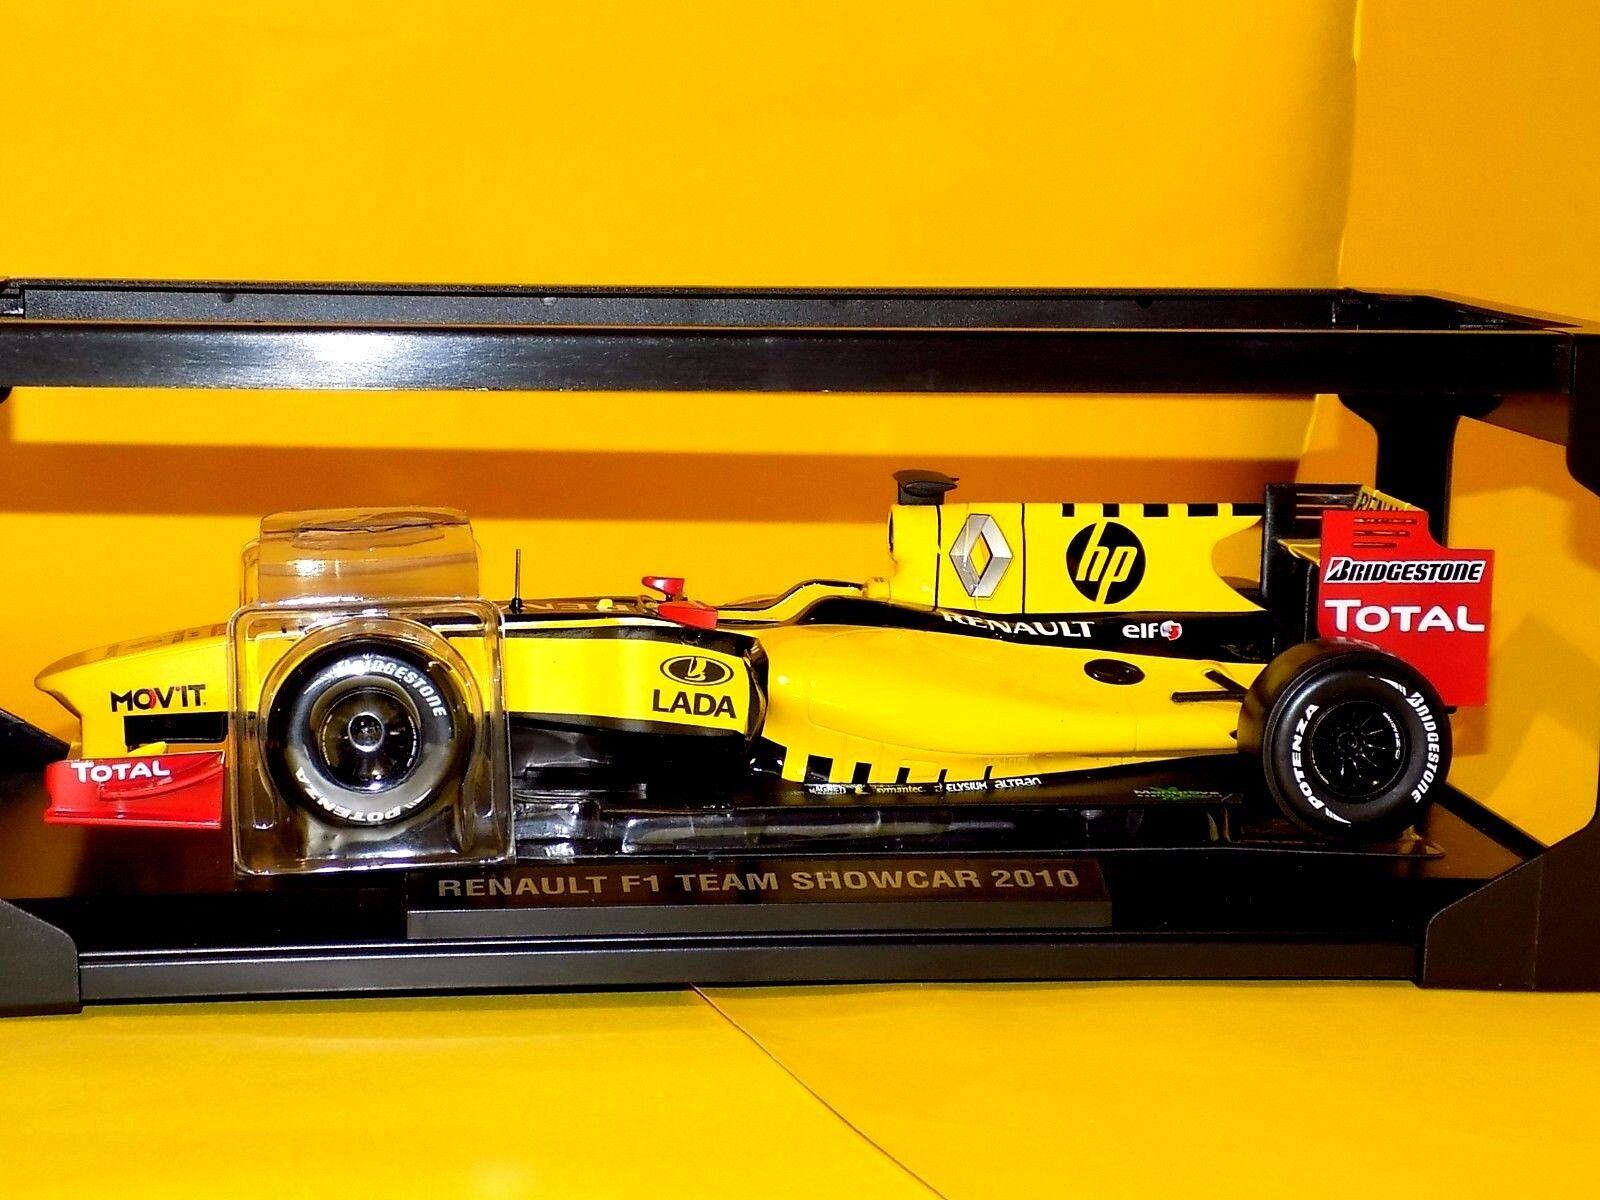 Renault F1 Team Showcar NOREV  185119  1 18